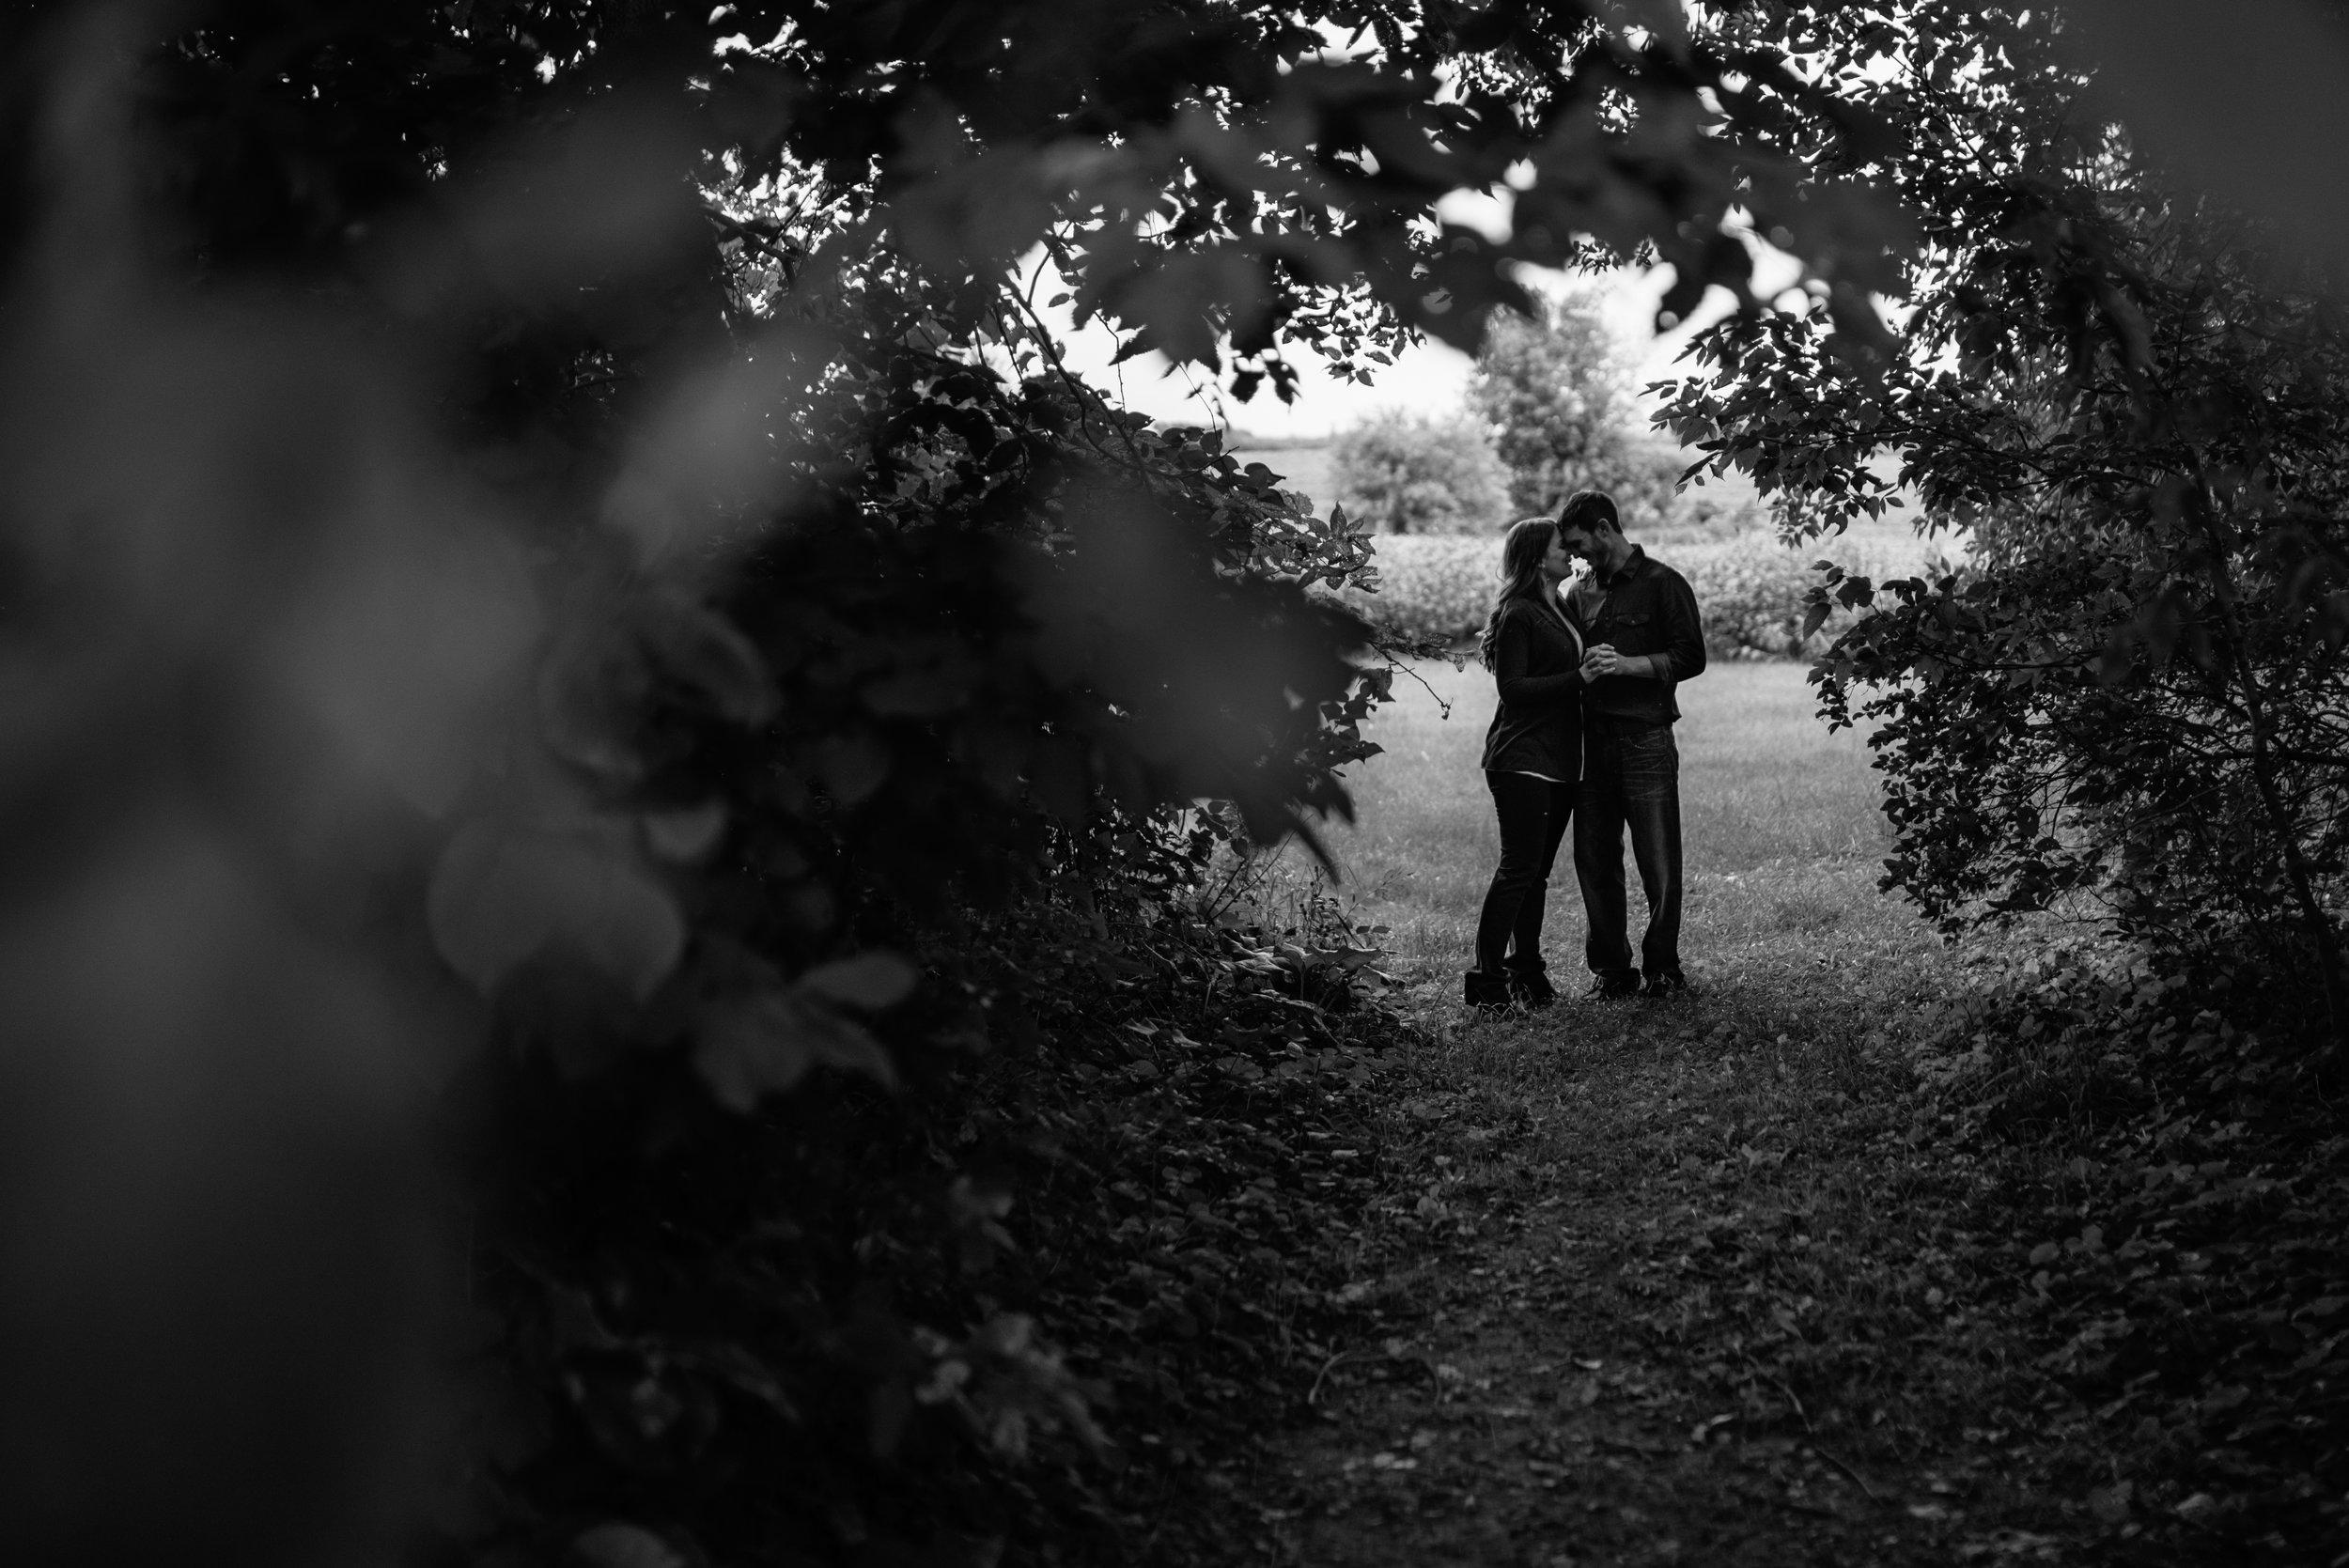 midwest-wedding-photographer-1-4.jpg